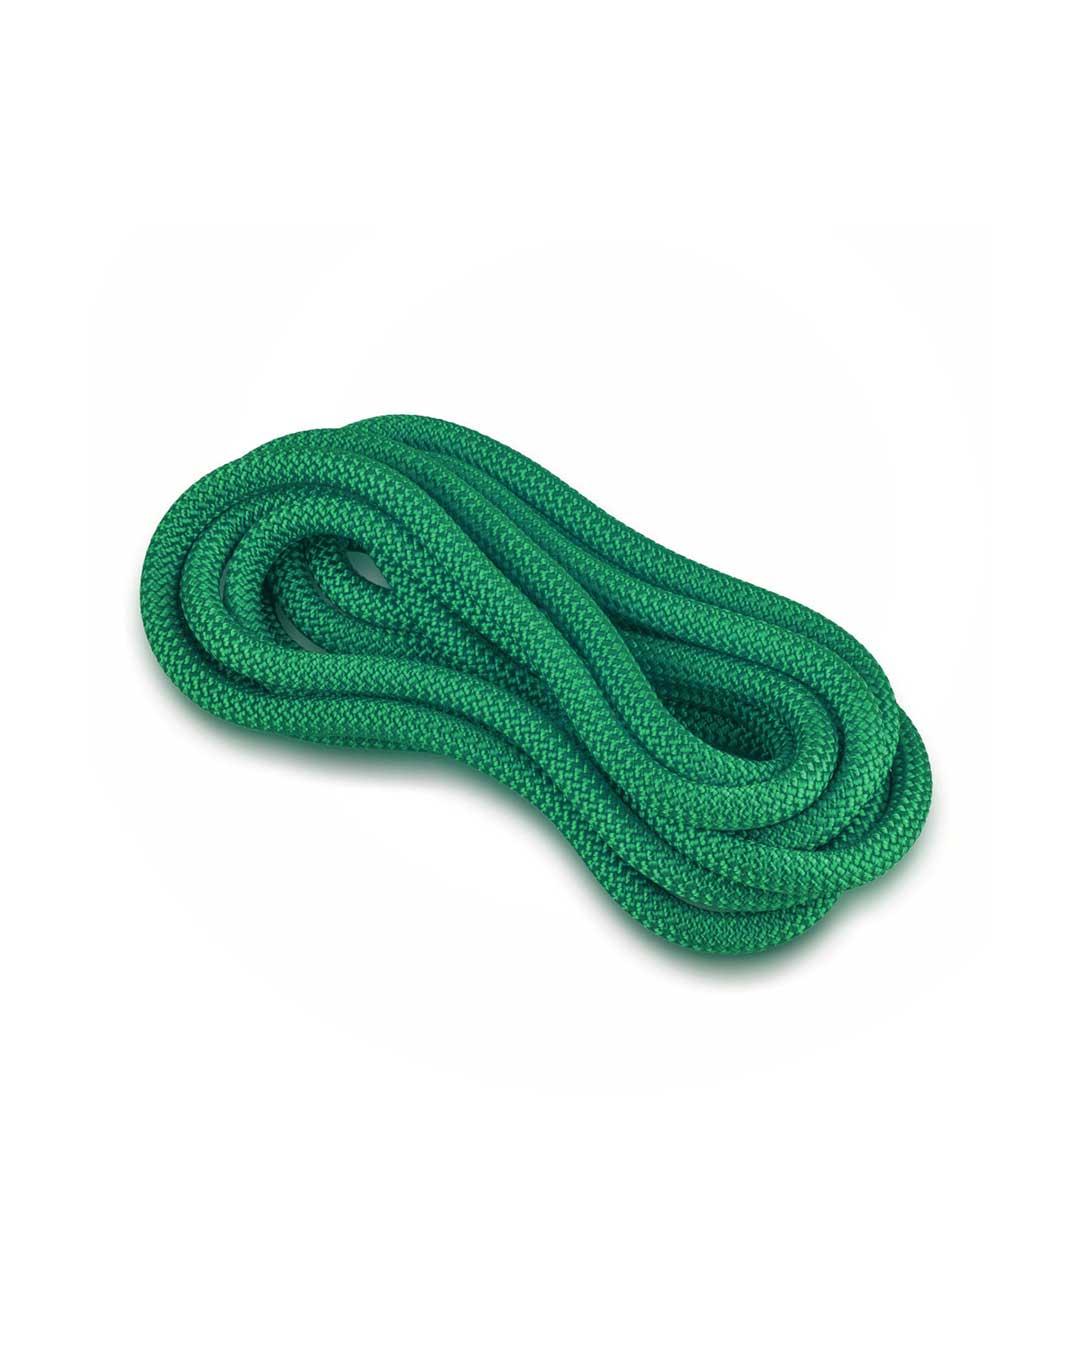 Cuerda de gimnasia rítmica VENTURELLI (Certificada FIG) verde oscuro - 3 m